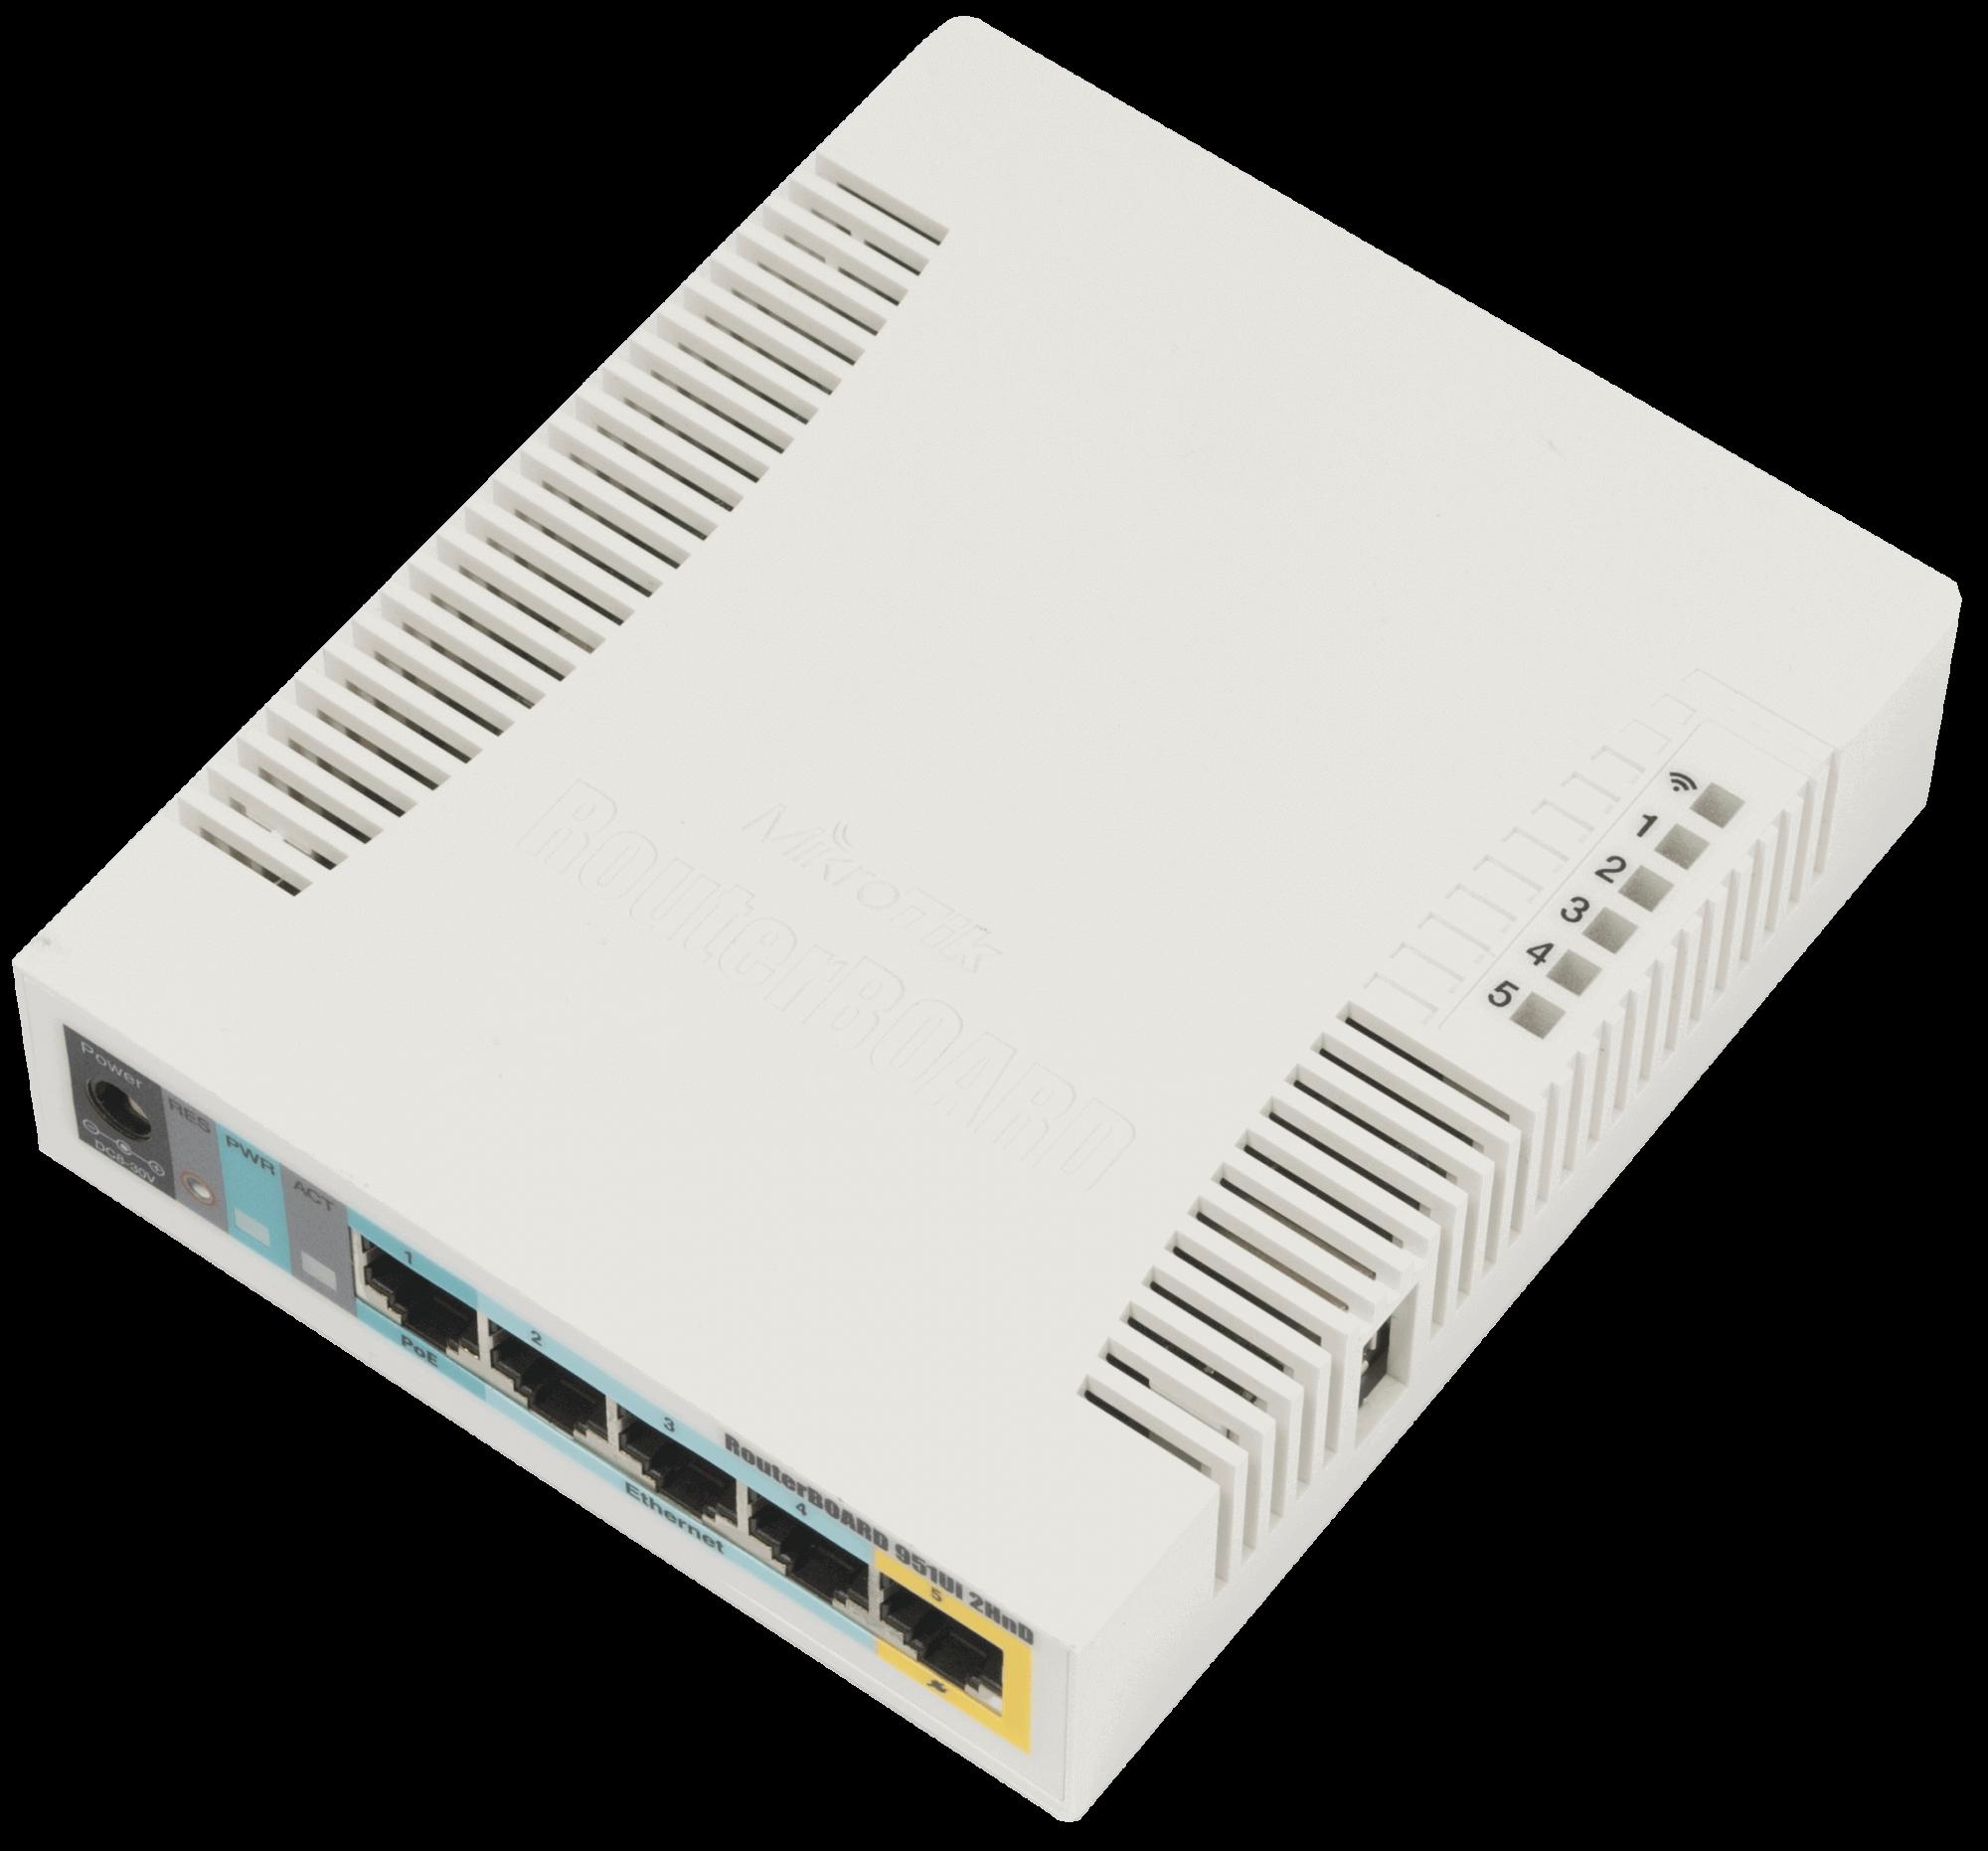 Roteador Mikrotik RB951-2HnD